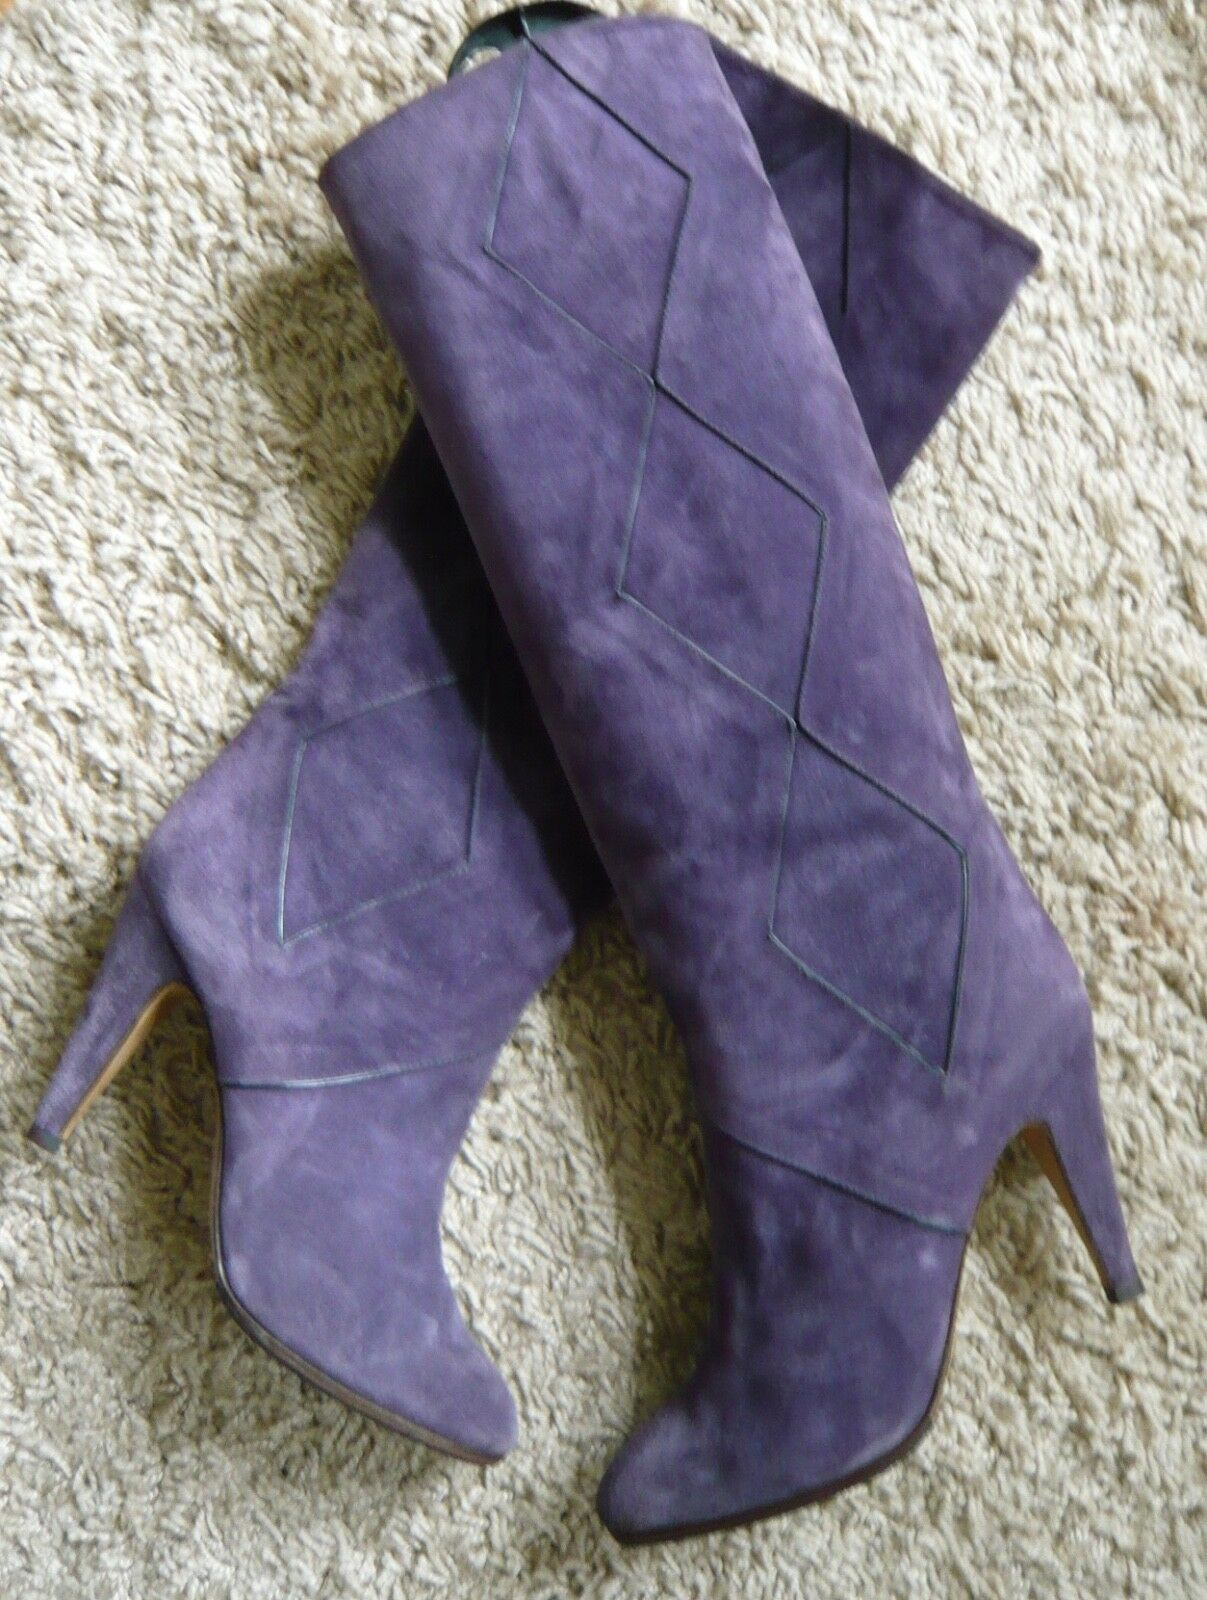 Original italiano vintage botas Ferdin lila oscuro visualmente